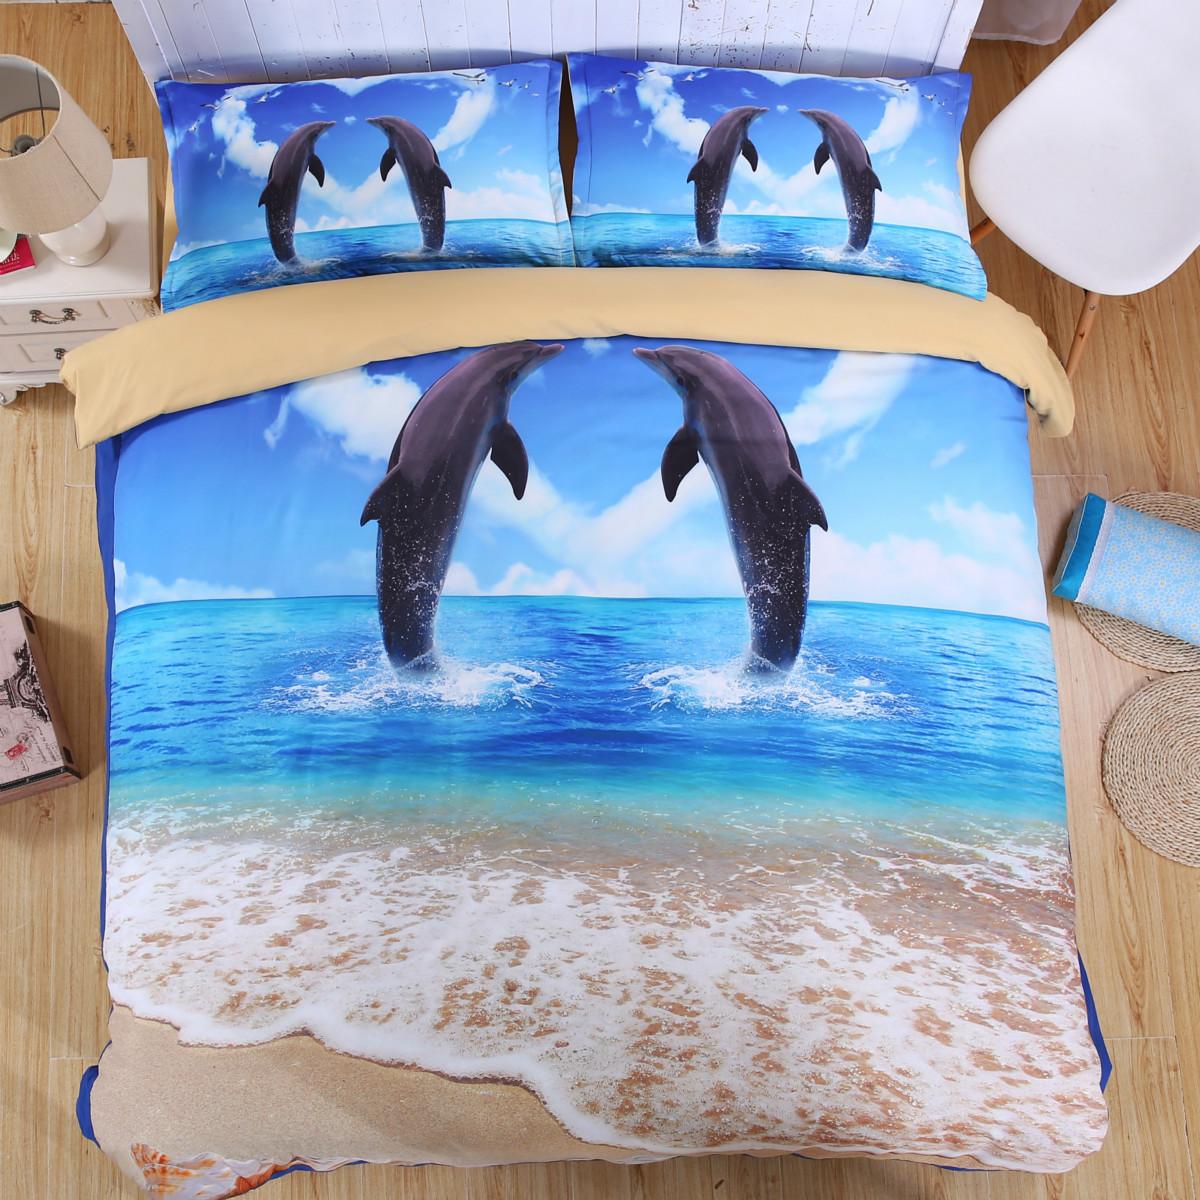 microfiber 3d printing bedding sets dolphin bedding sets kid 39 s bedding sets duvet covers sets. Black Bedroom Furniture Sets. Home Design Ideas